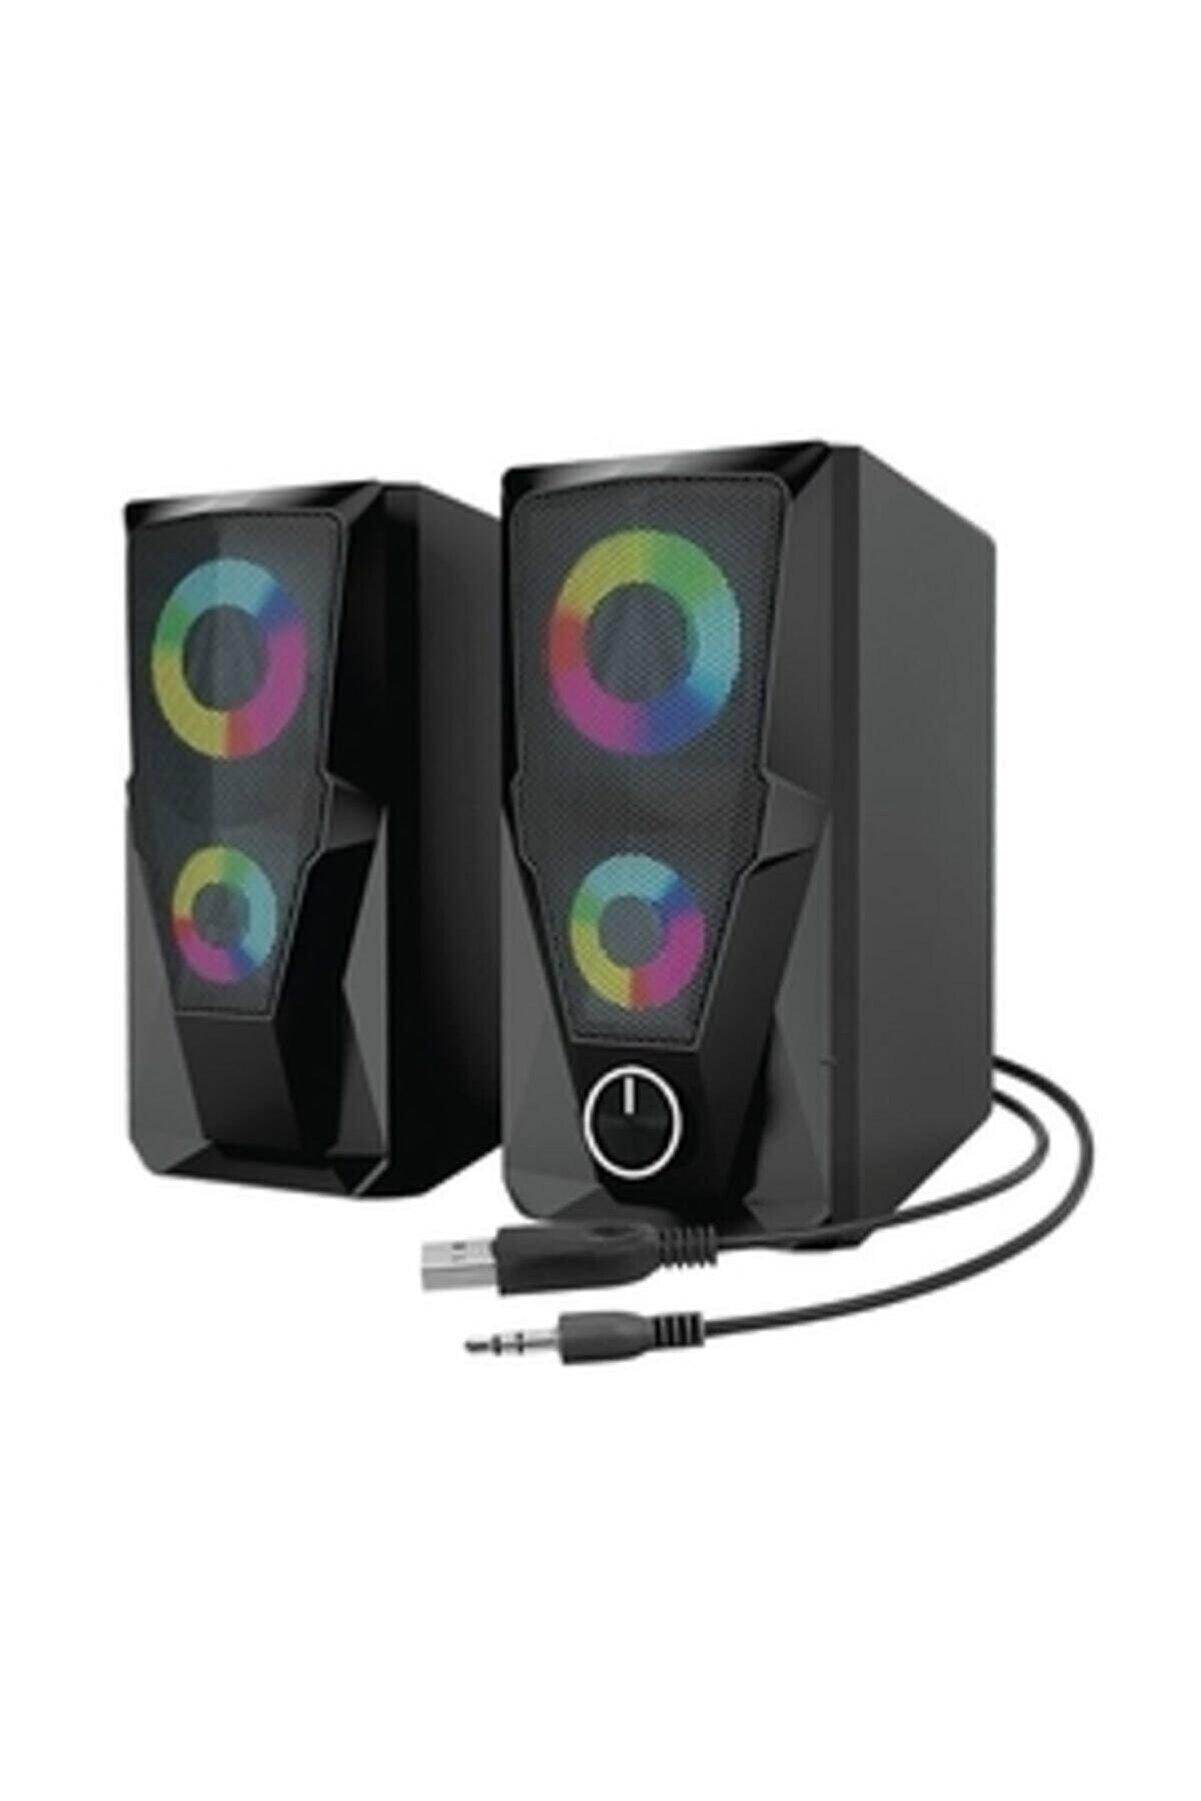 Mikado Md-336 2.0 6 Watt Rgb Ledli Siyah Multimedia Usb Speaker